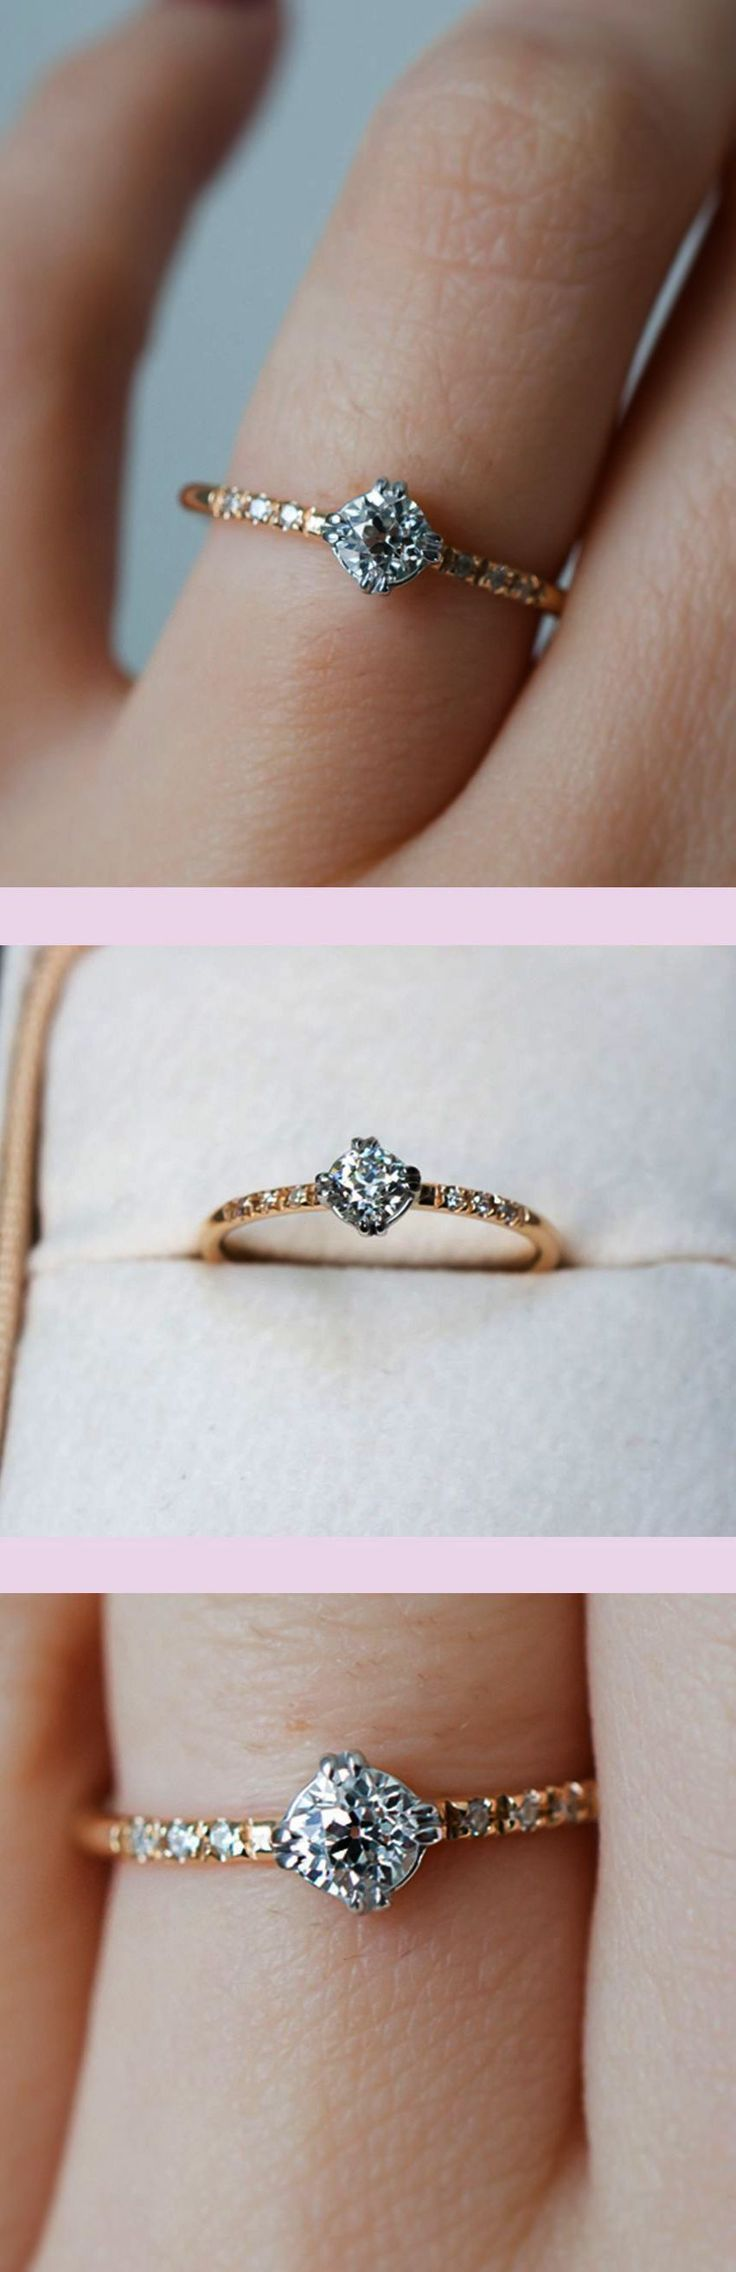 Rose Gold Vintage Engagement Rings upon Vintage Black Diamond Engagement Rings U... Rose Gold Vintage Engagement Rings upon Vintage Black Diamond Engagement Rings U...  iDeas Rings Ideas ?